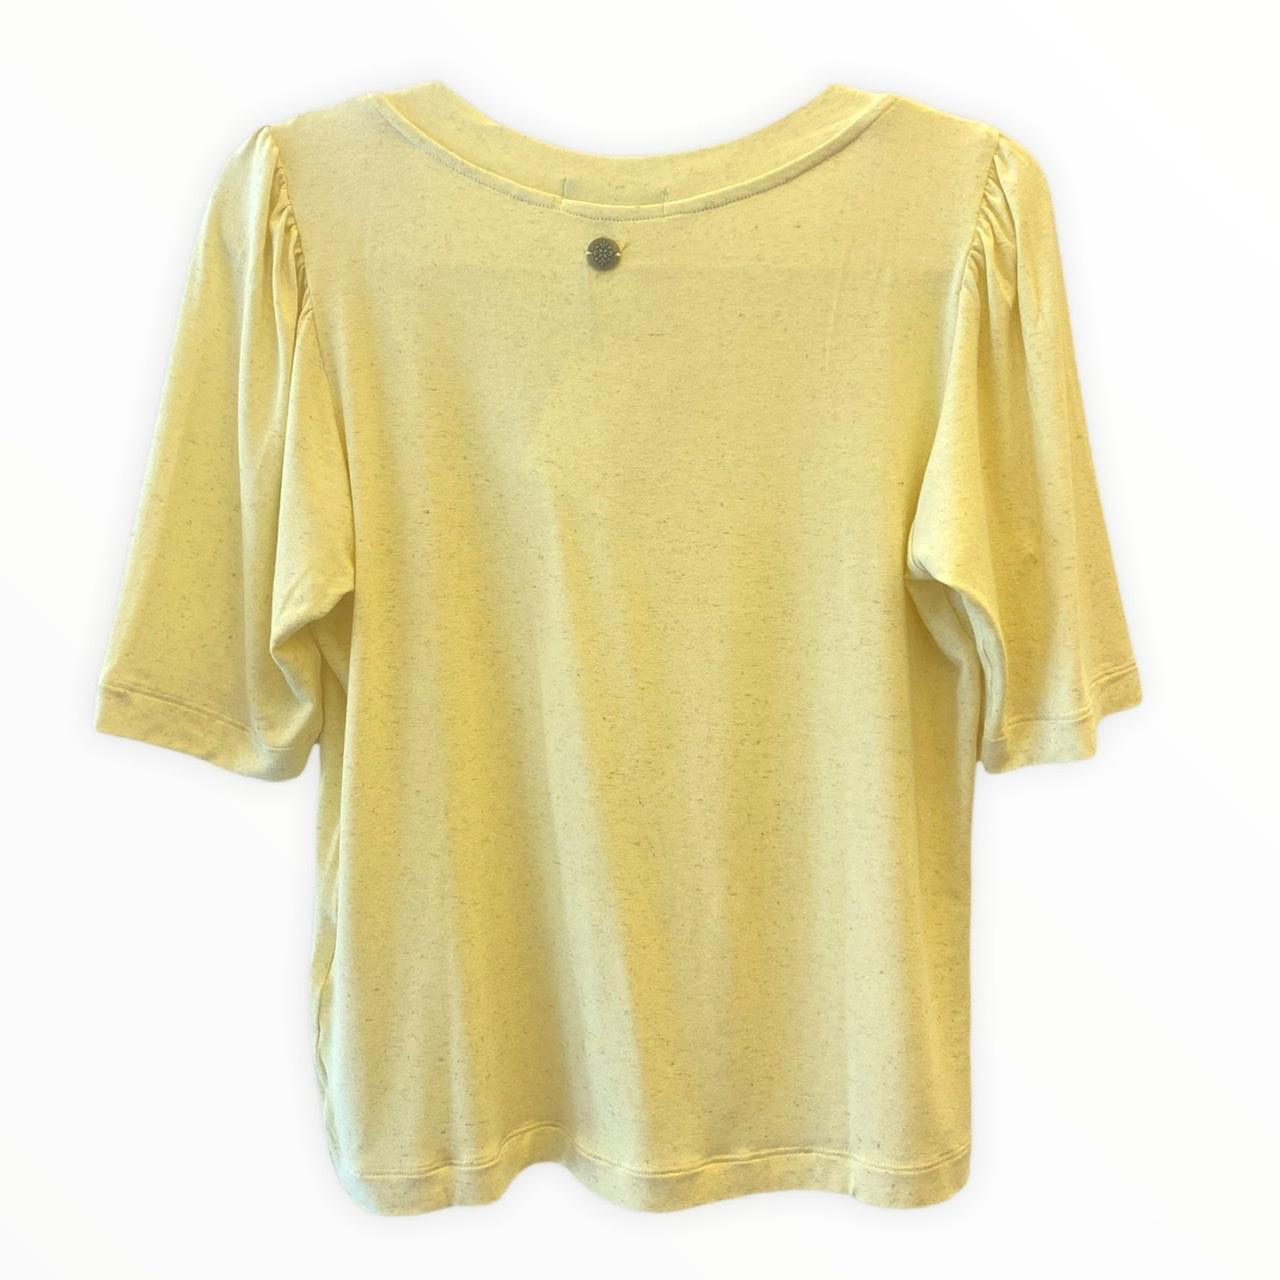 Blusa Clarissa amarela